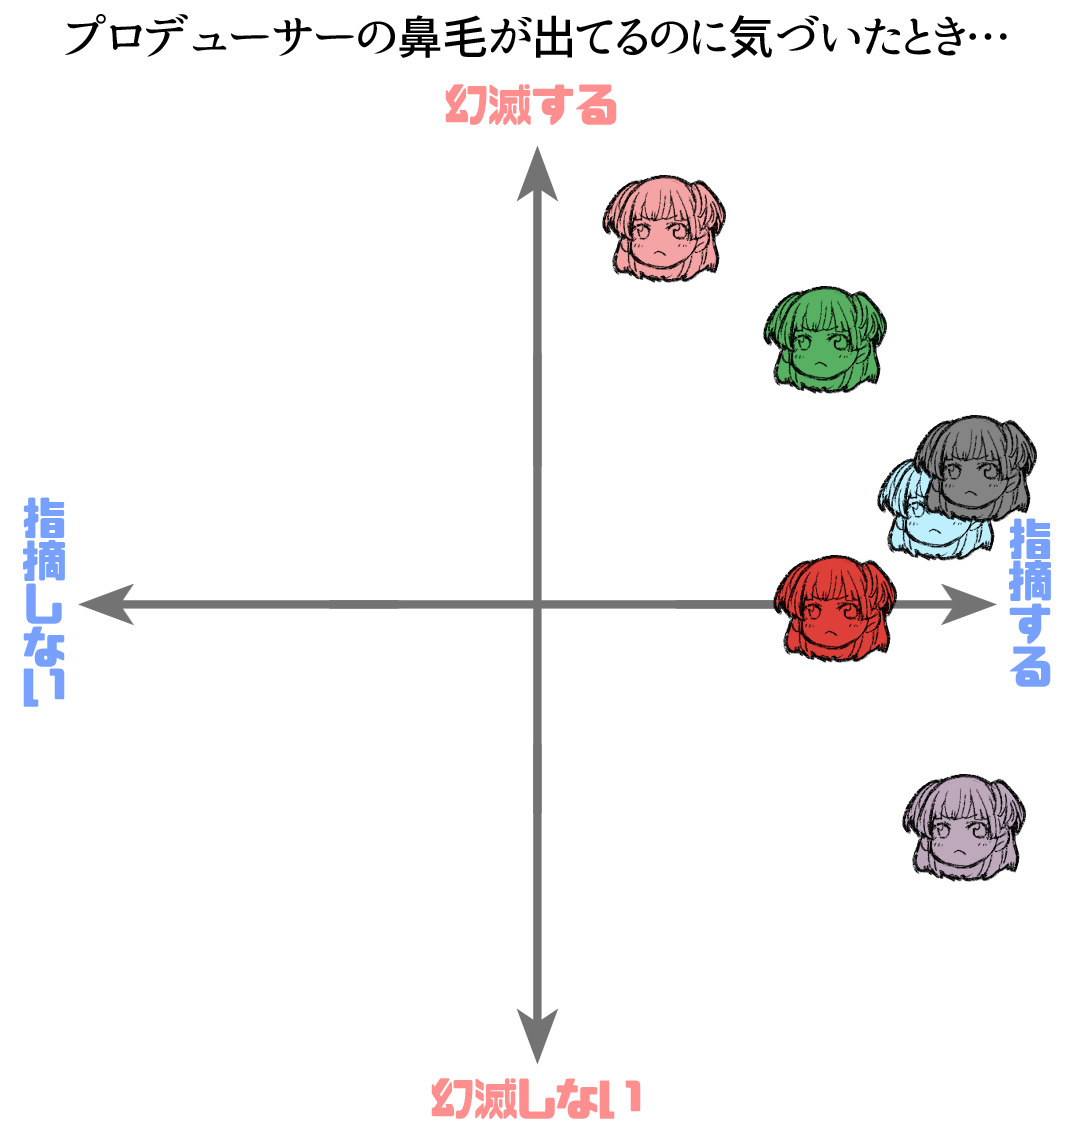 f:id:hoshi_sano:20200414113711j:image:w400